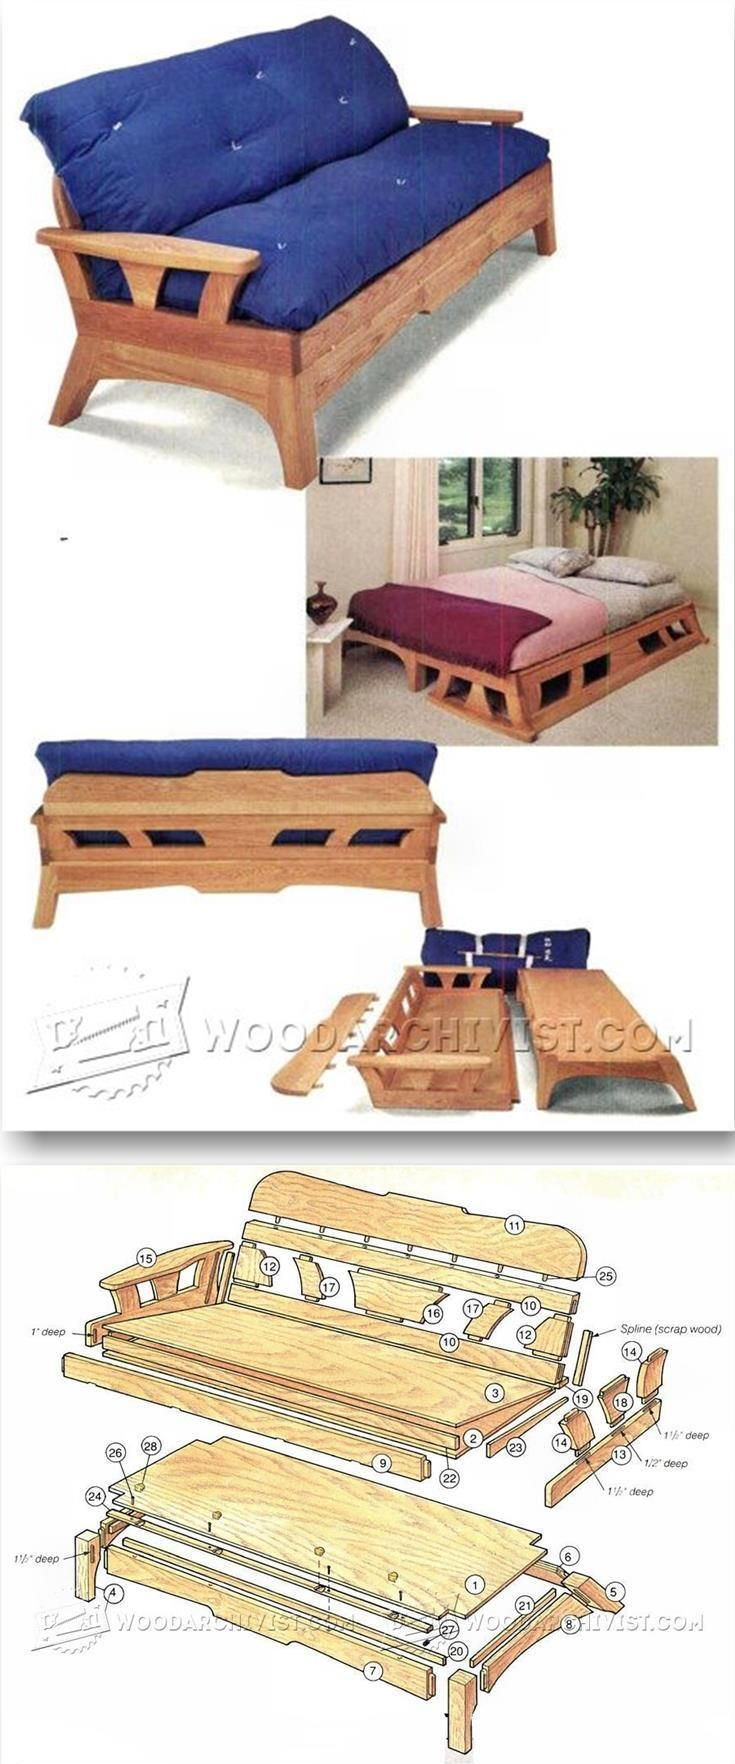 Futon Sofa Bed Plans Furniture And Projects Woodarchivist Com Furnitureplans Woodworkingtips Woodworkingplans